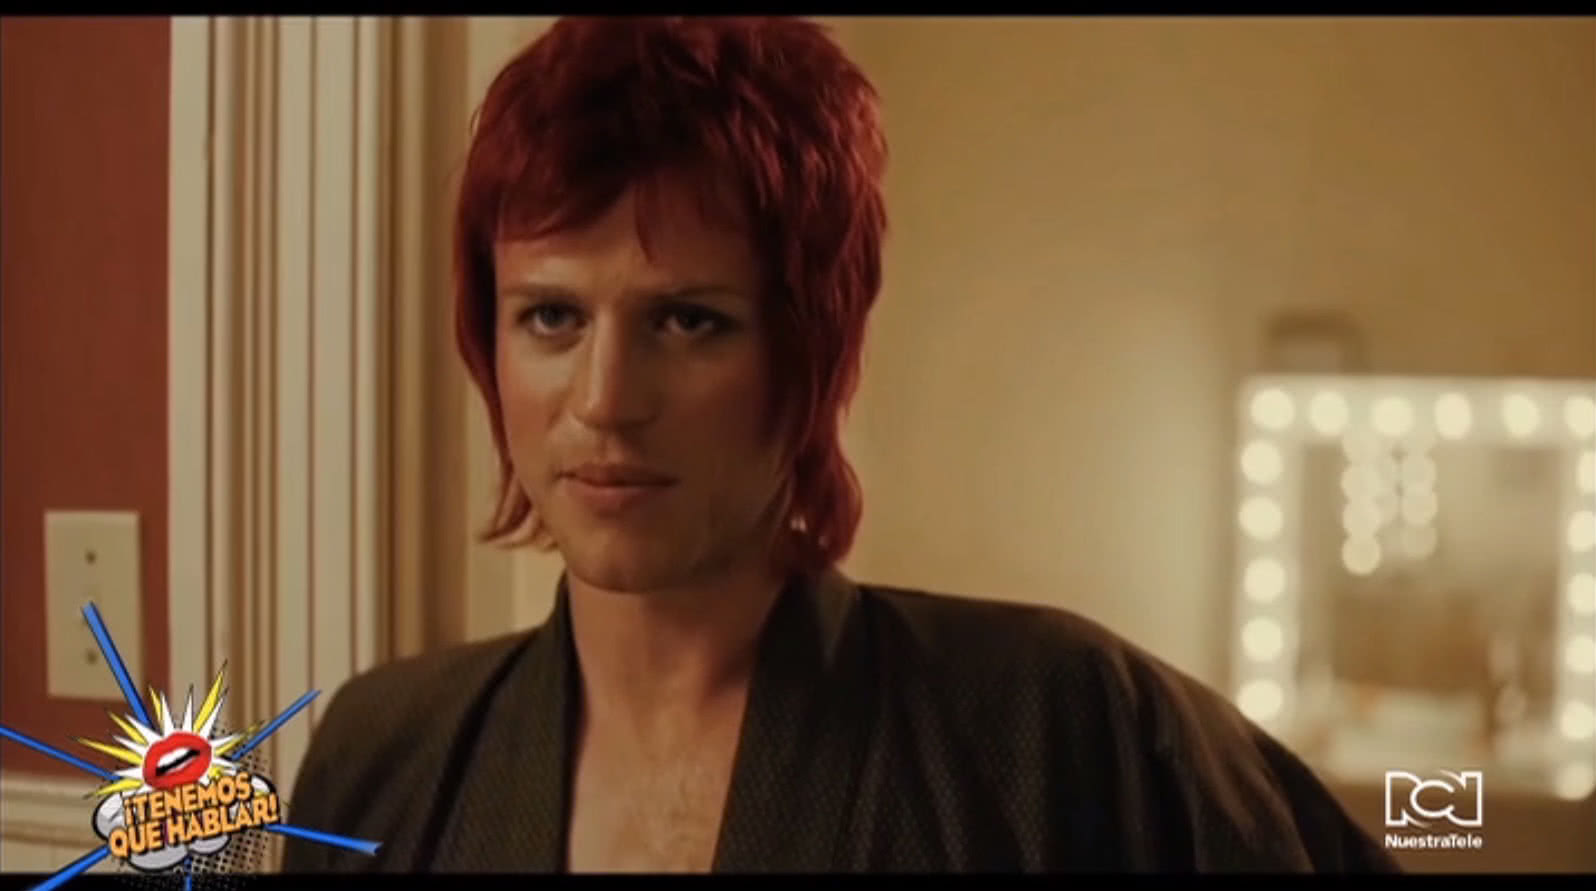 Stardust: Pelicula de David Bowie se estrenará este 25 de noviembre gracias a IFC Films